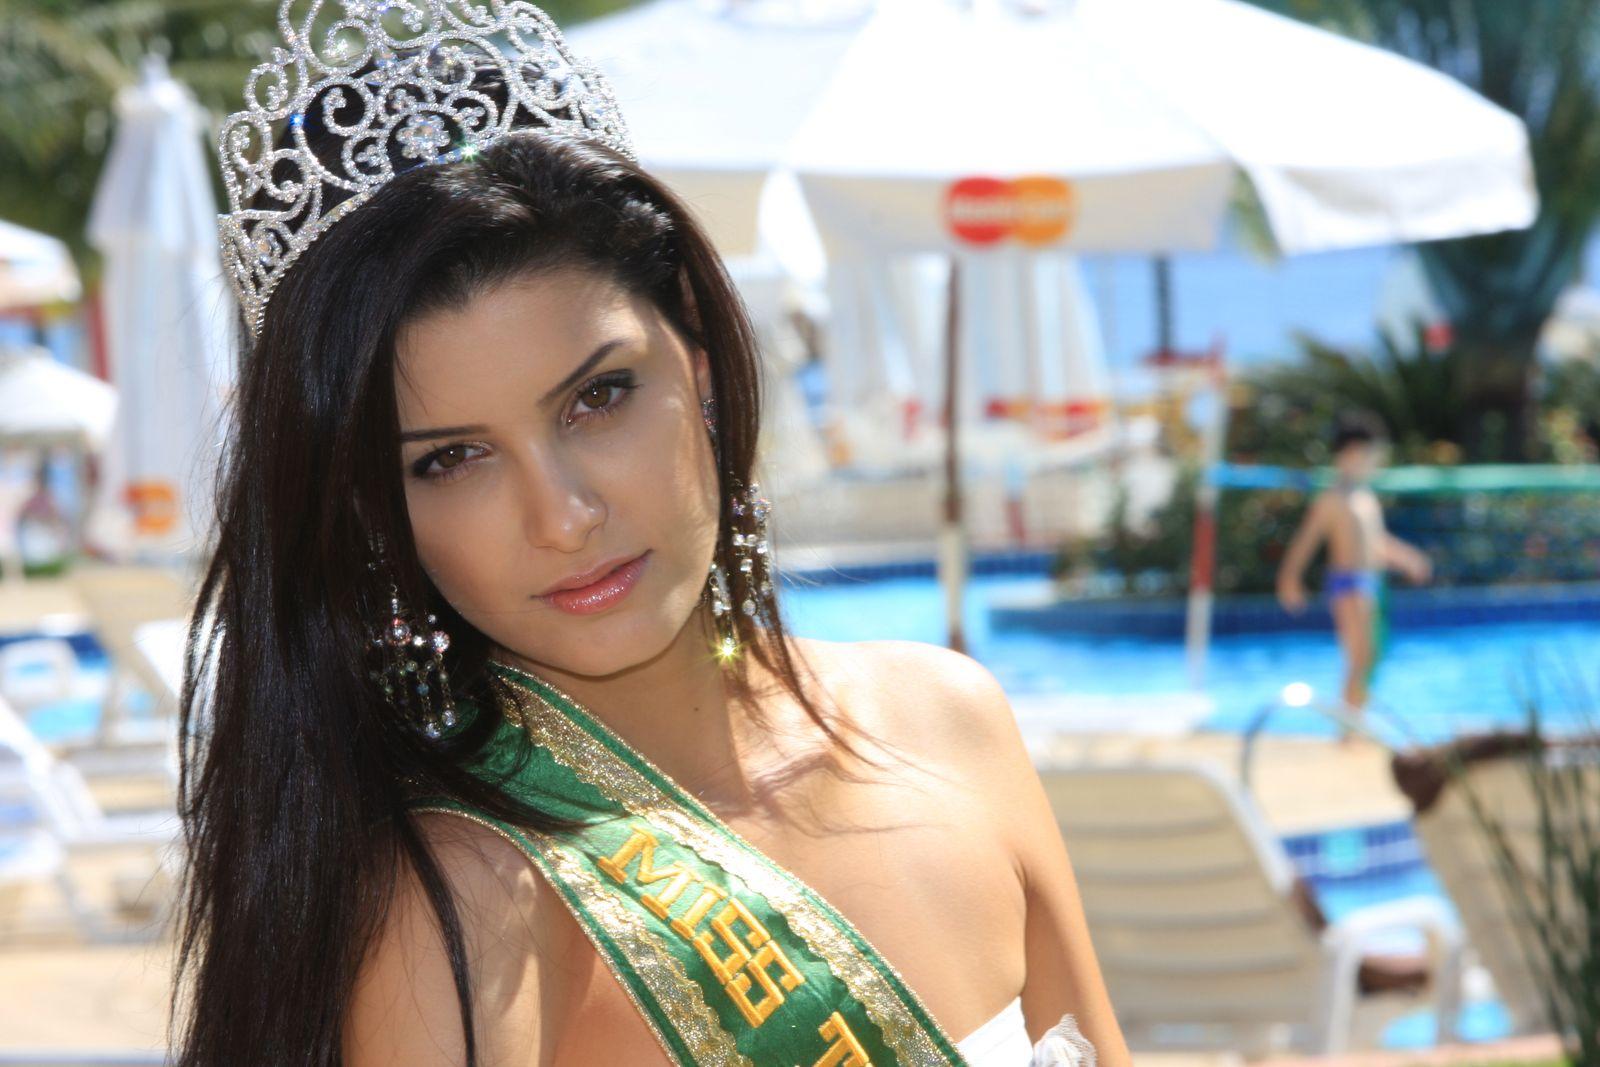 vivian noronha, rainha hispanoamericana 2008. suplente. - Página 2 Key7es7s